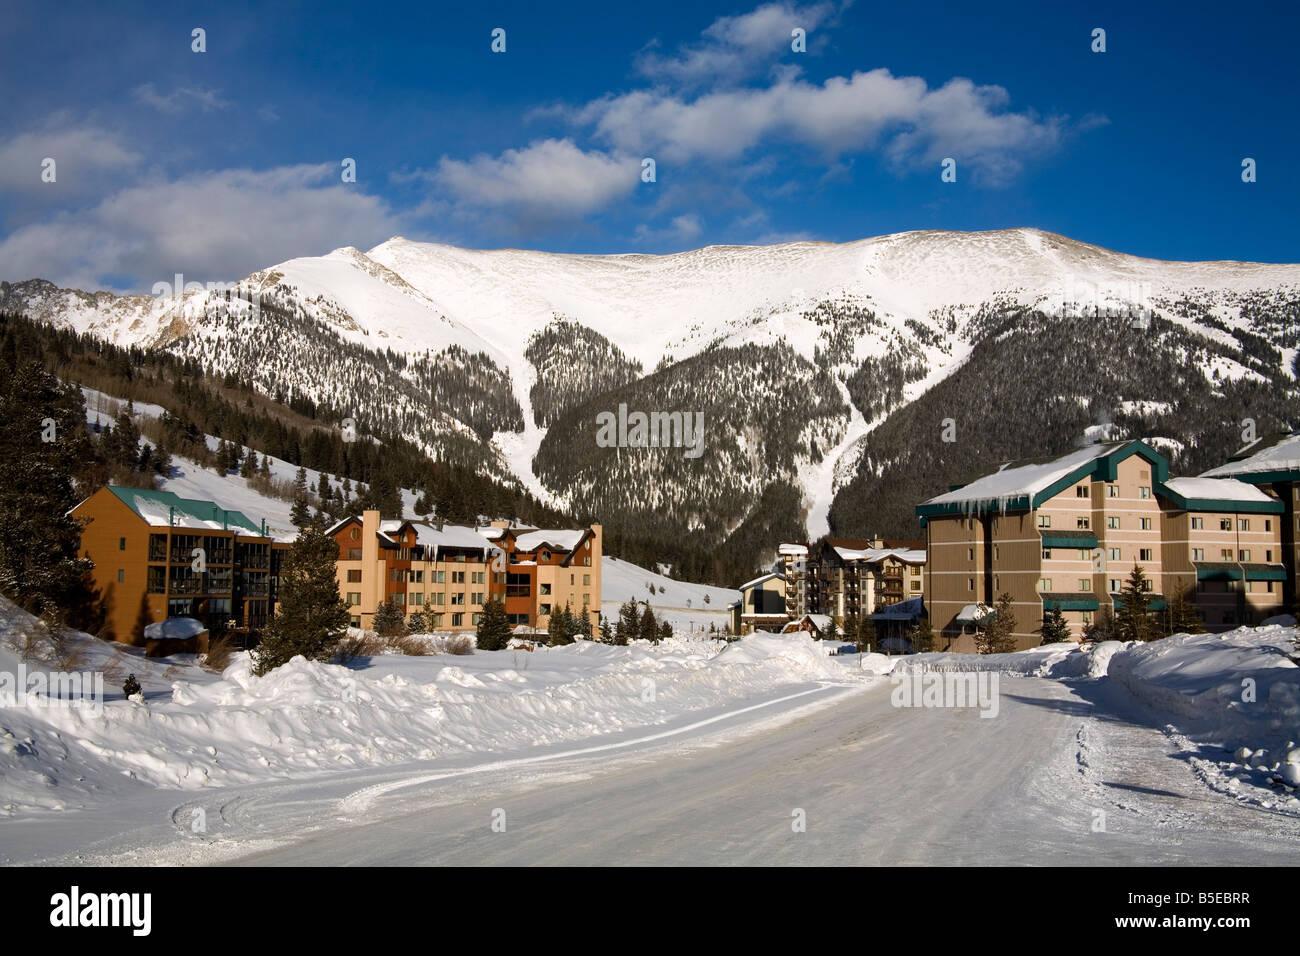 copper mountain ski resort, rocky mountains, colorado, usa, north